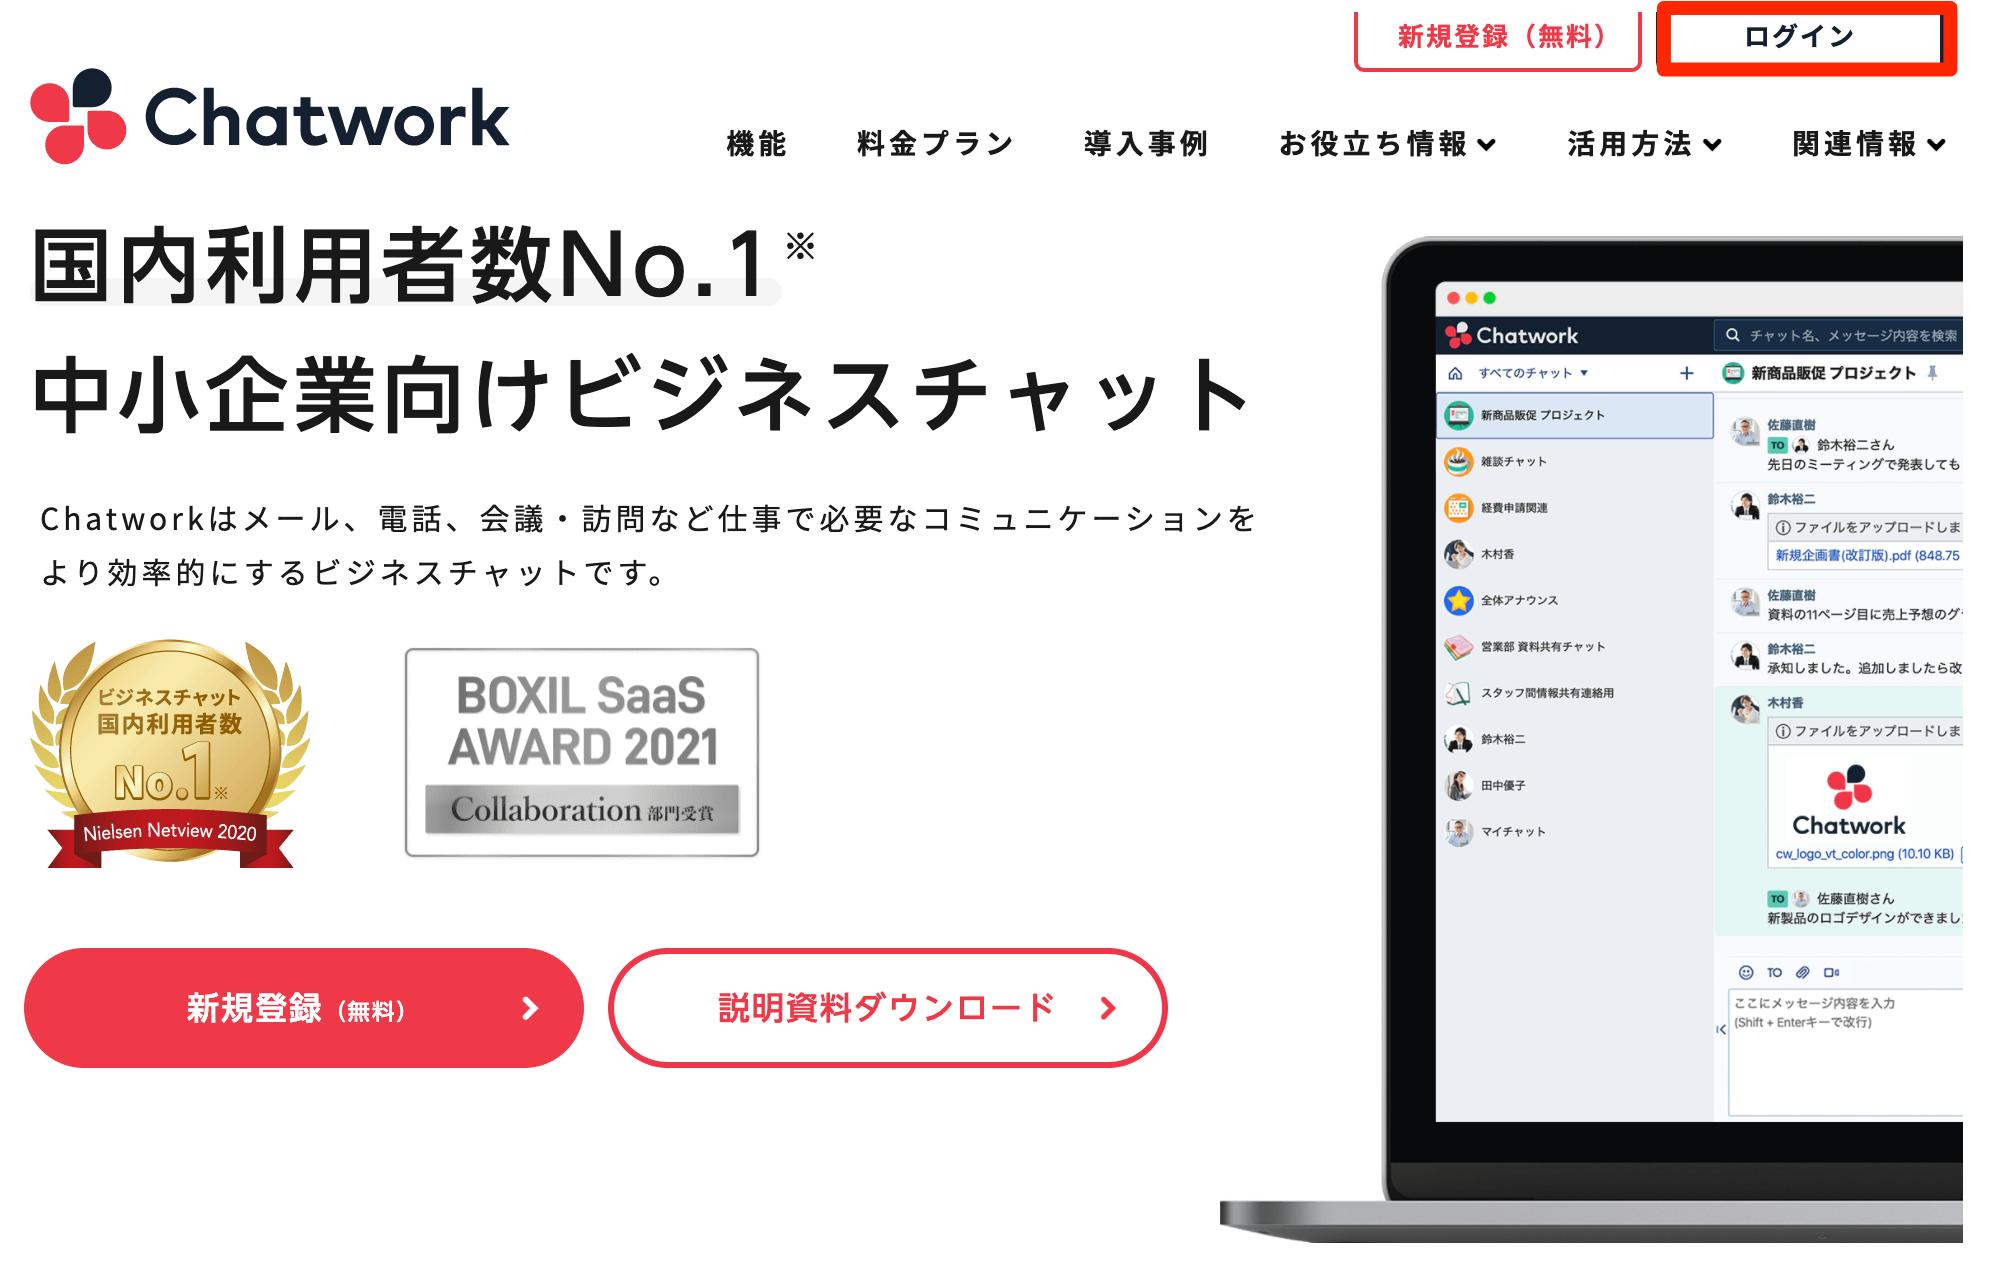 01_Chatworkにログインする方法:ブラウザ版.png